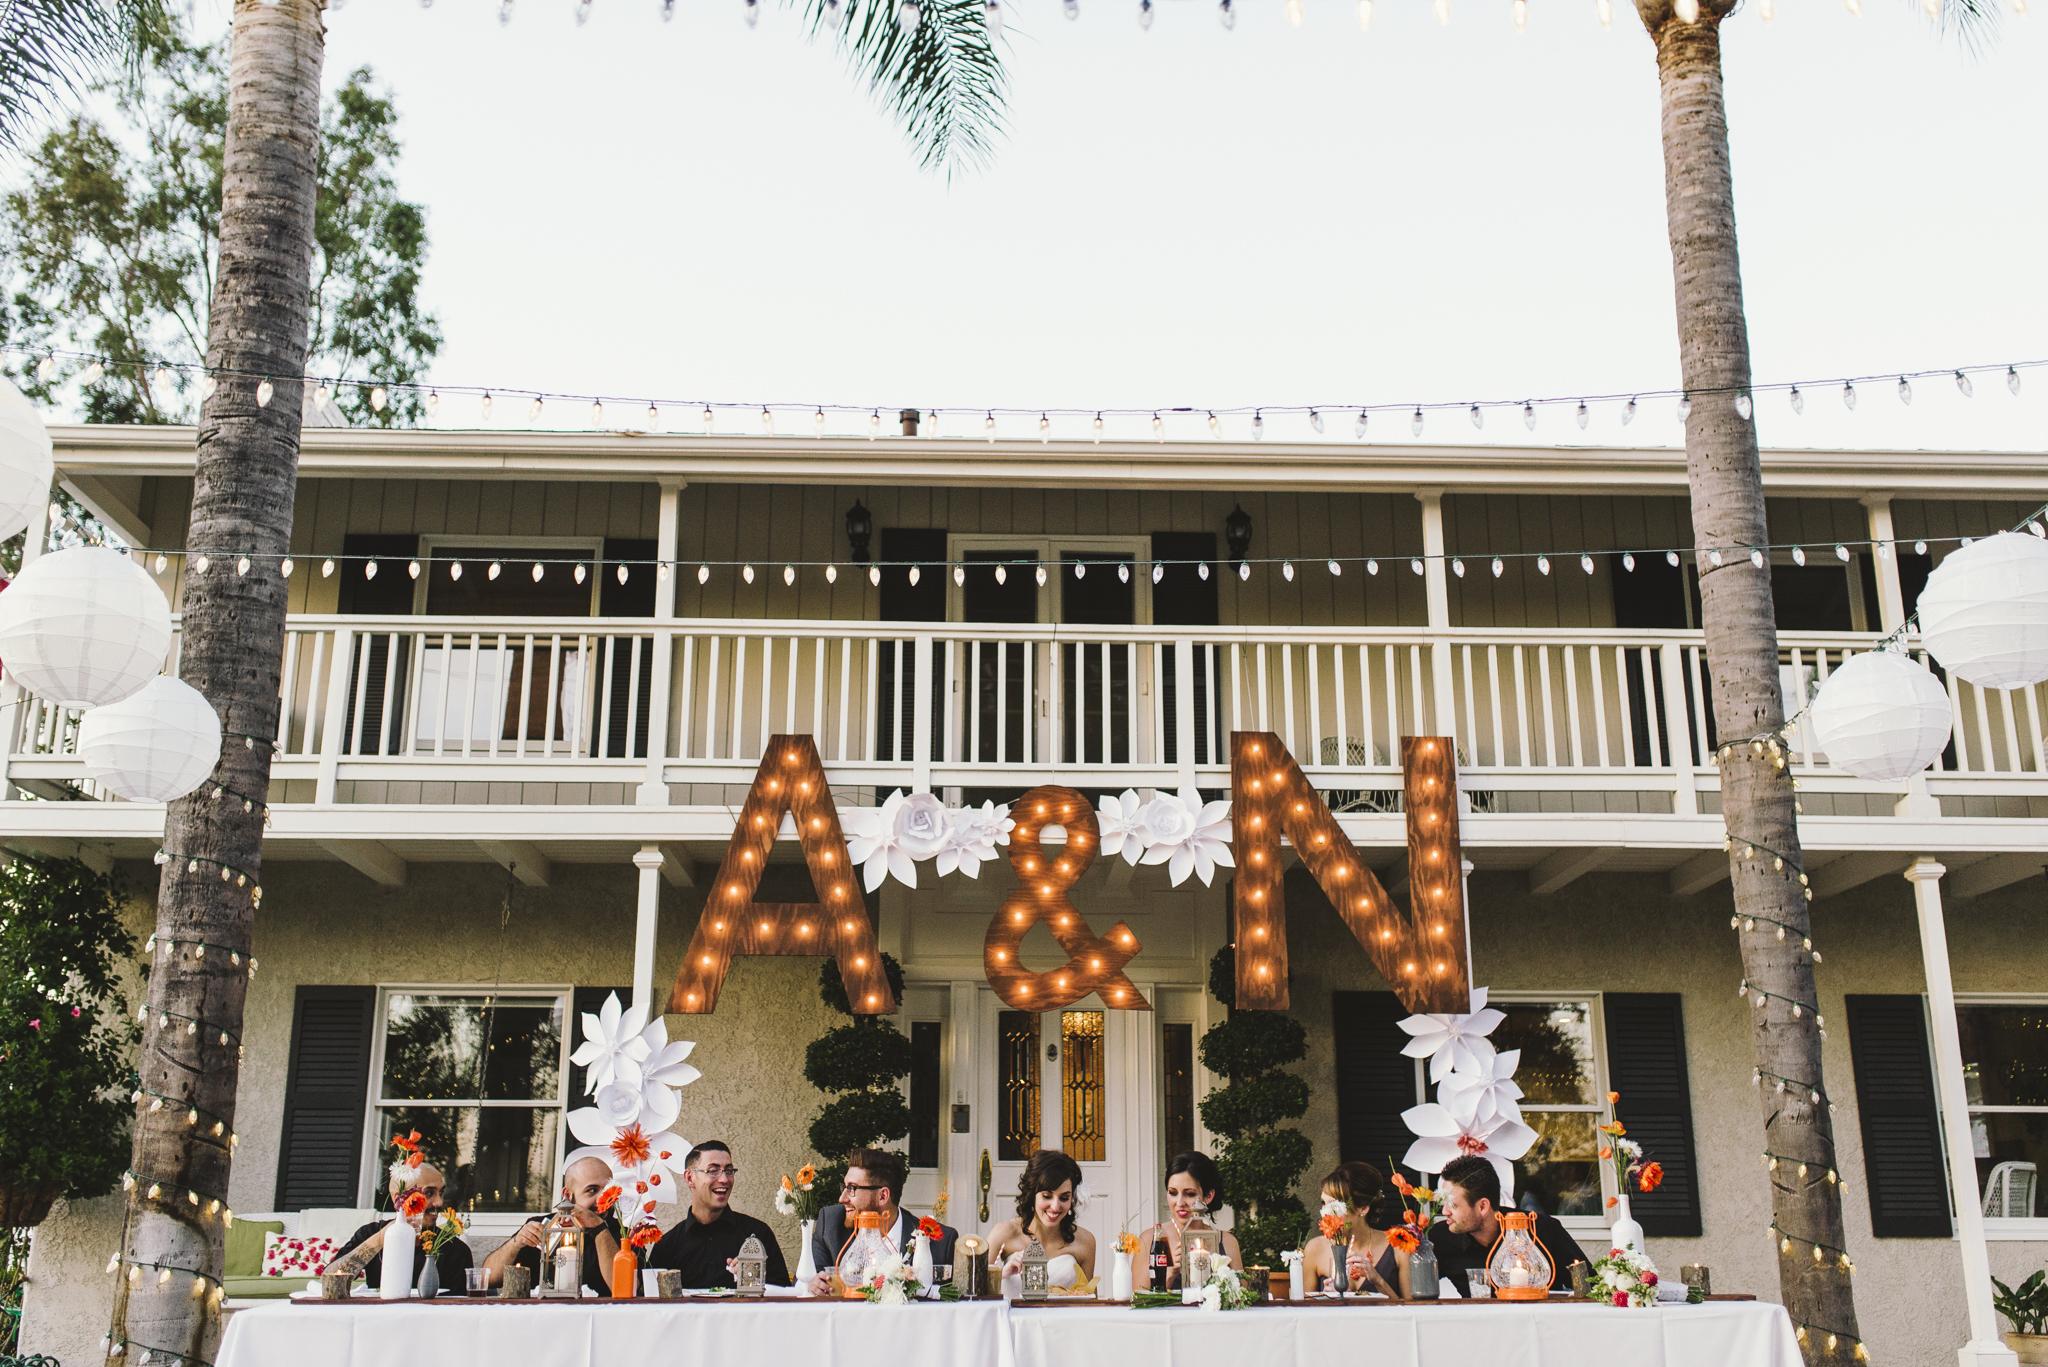 Isaiah & Taylor Photography - Los Angeles Lifestyle Wedding Photographer-48.jpg